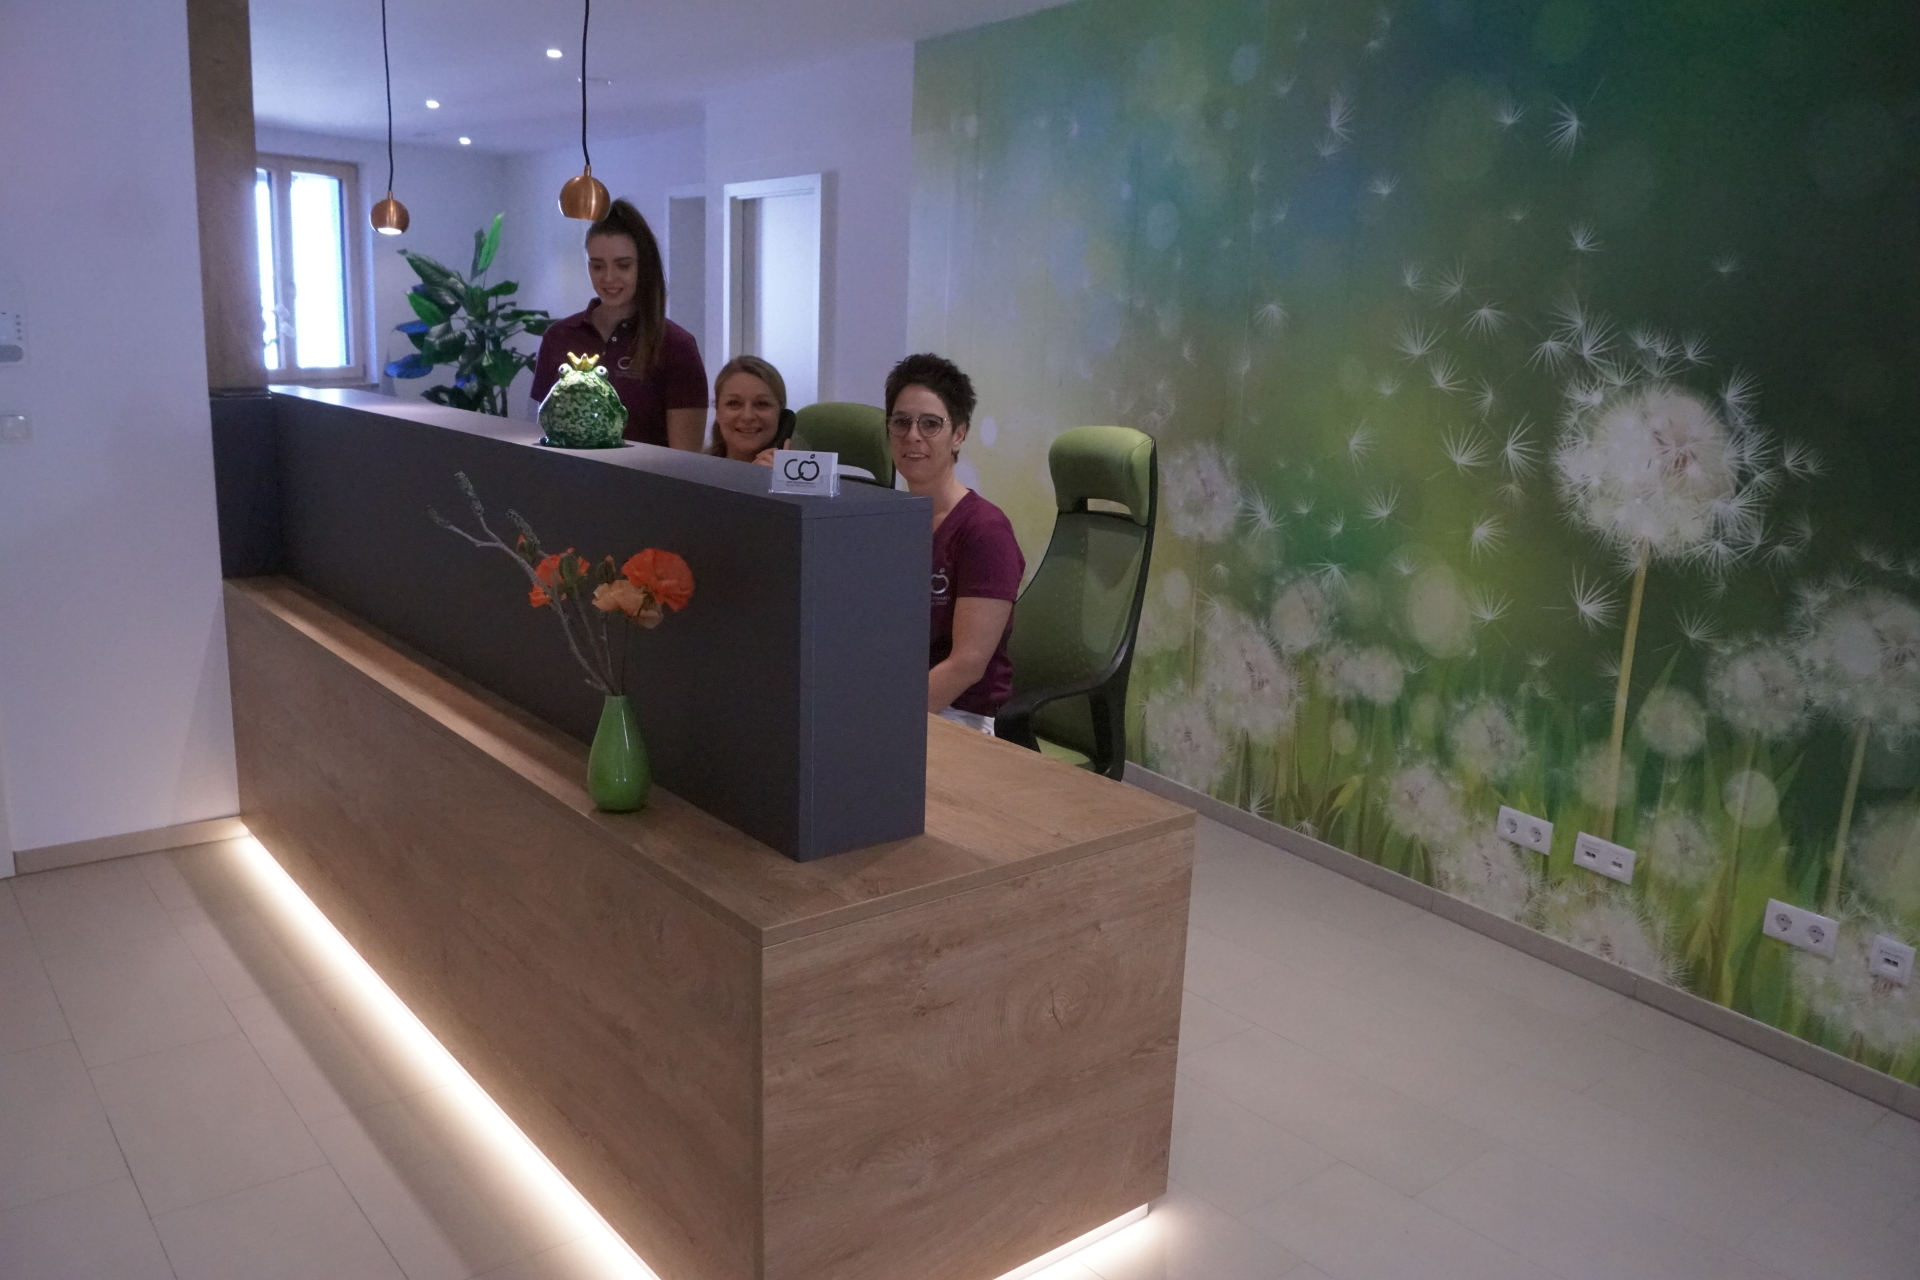 Willkommen in der Hausarztpraxis Unkel